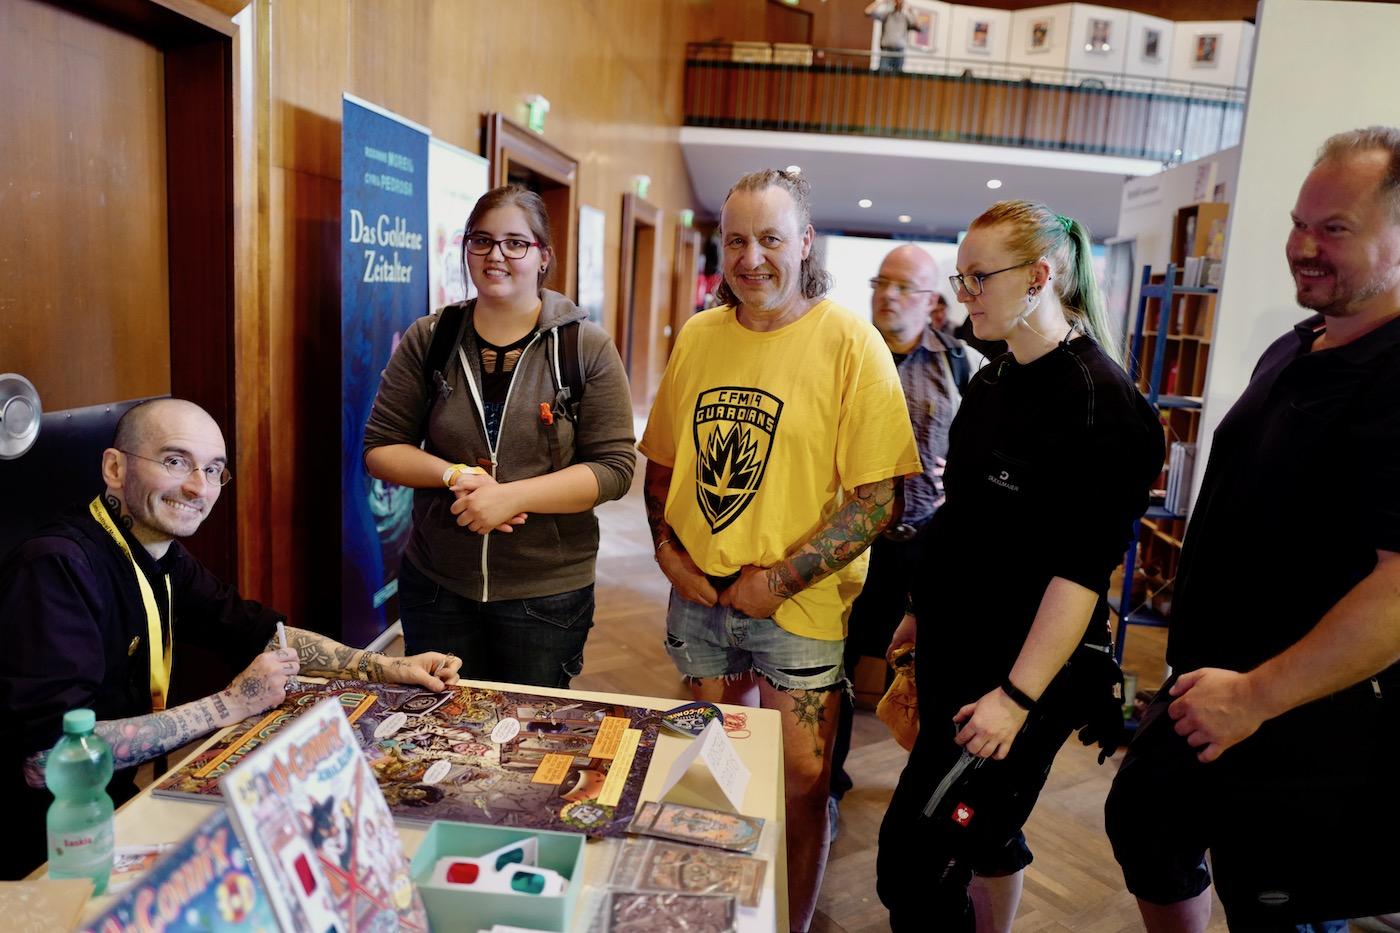 mark_benecke_comic_festival_muenchen_munich_comic_con_2019 - 33.jpg